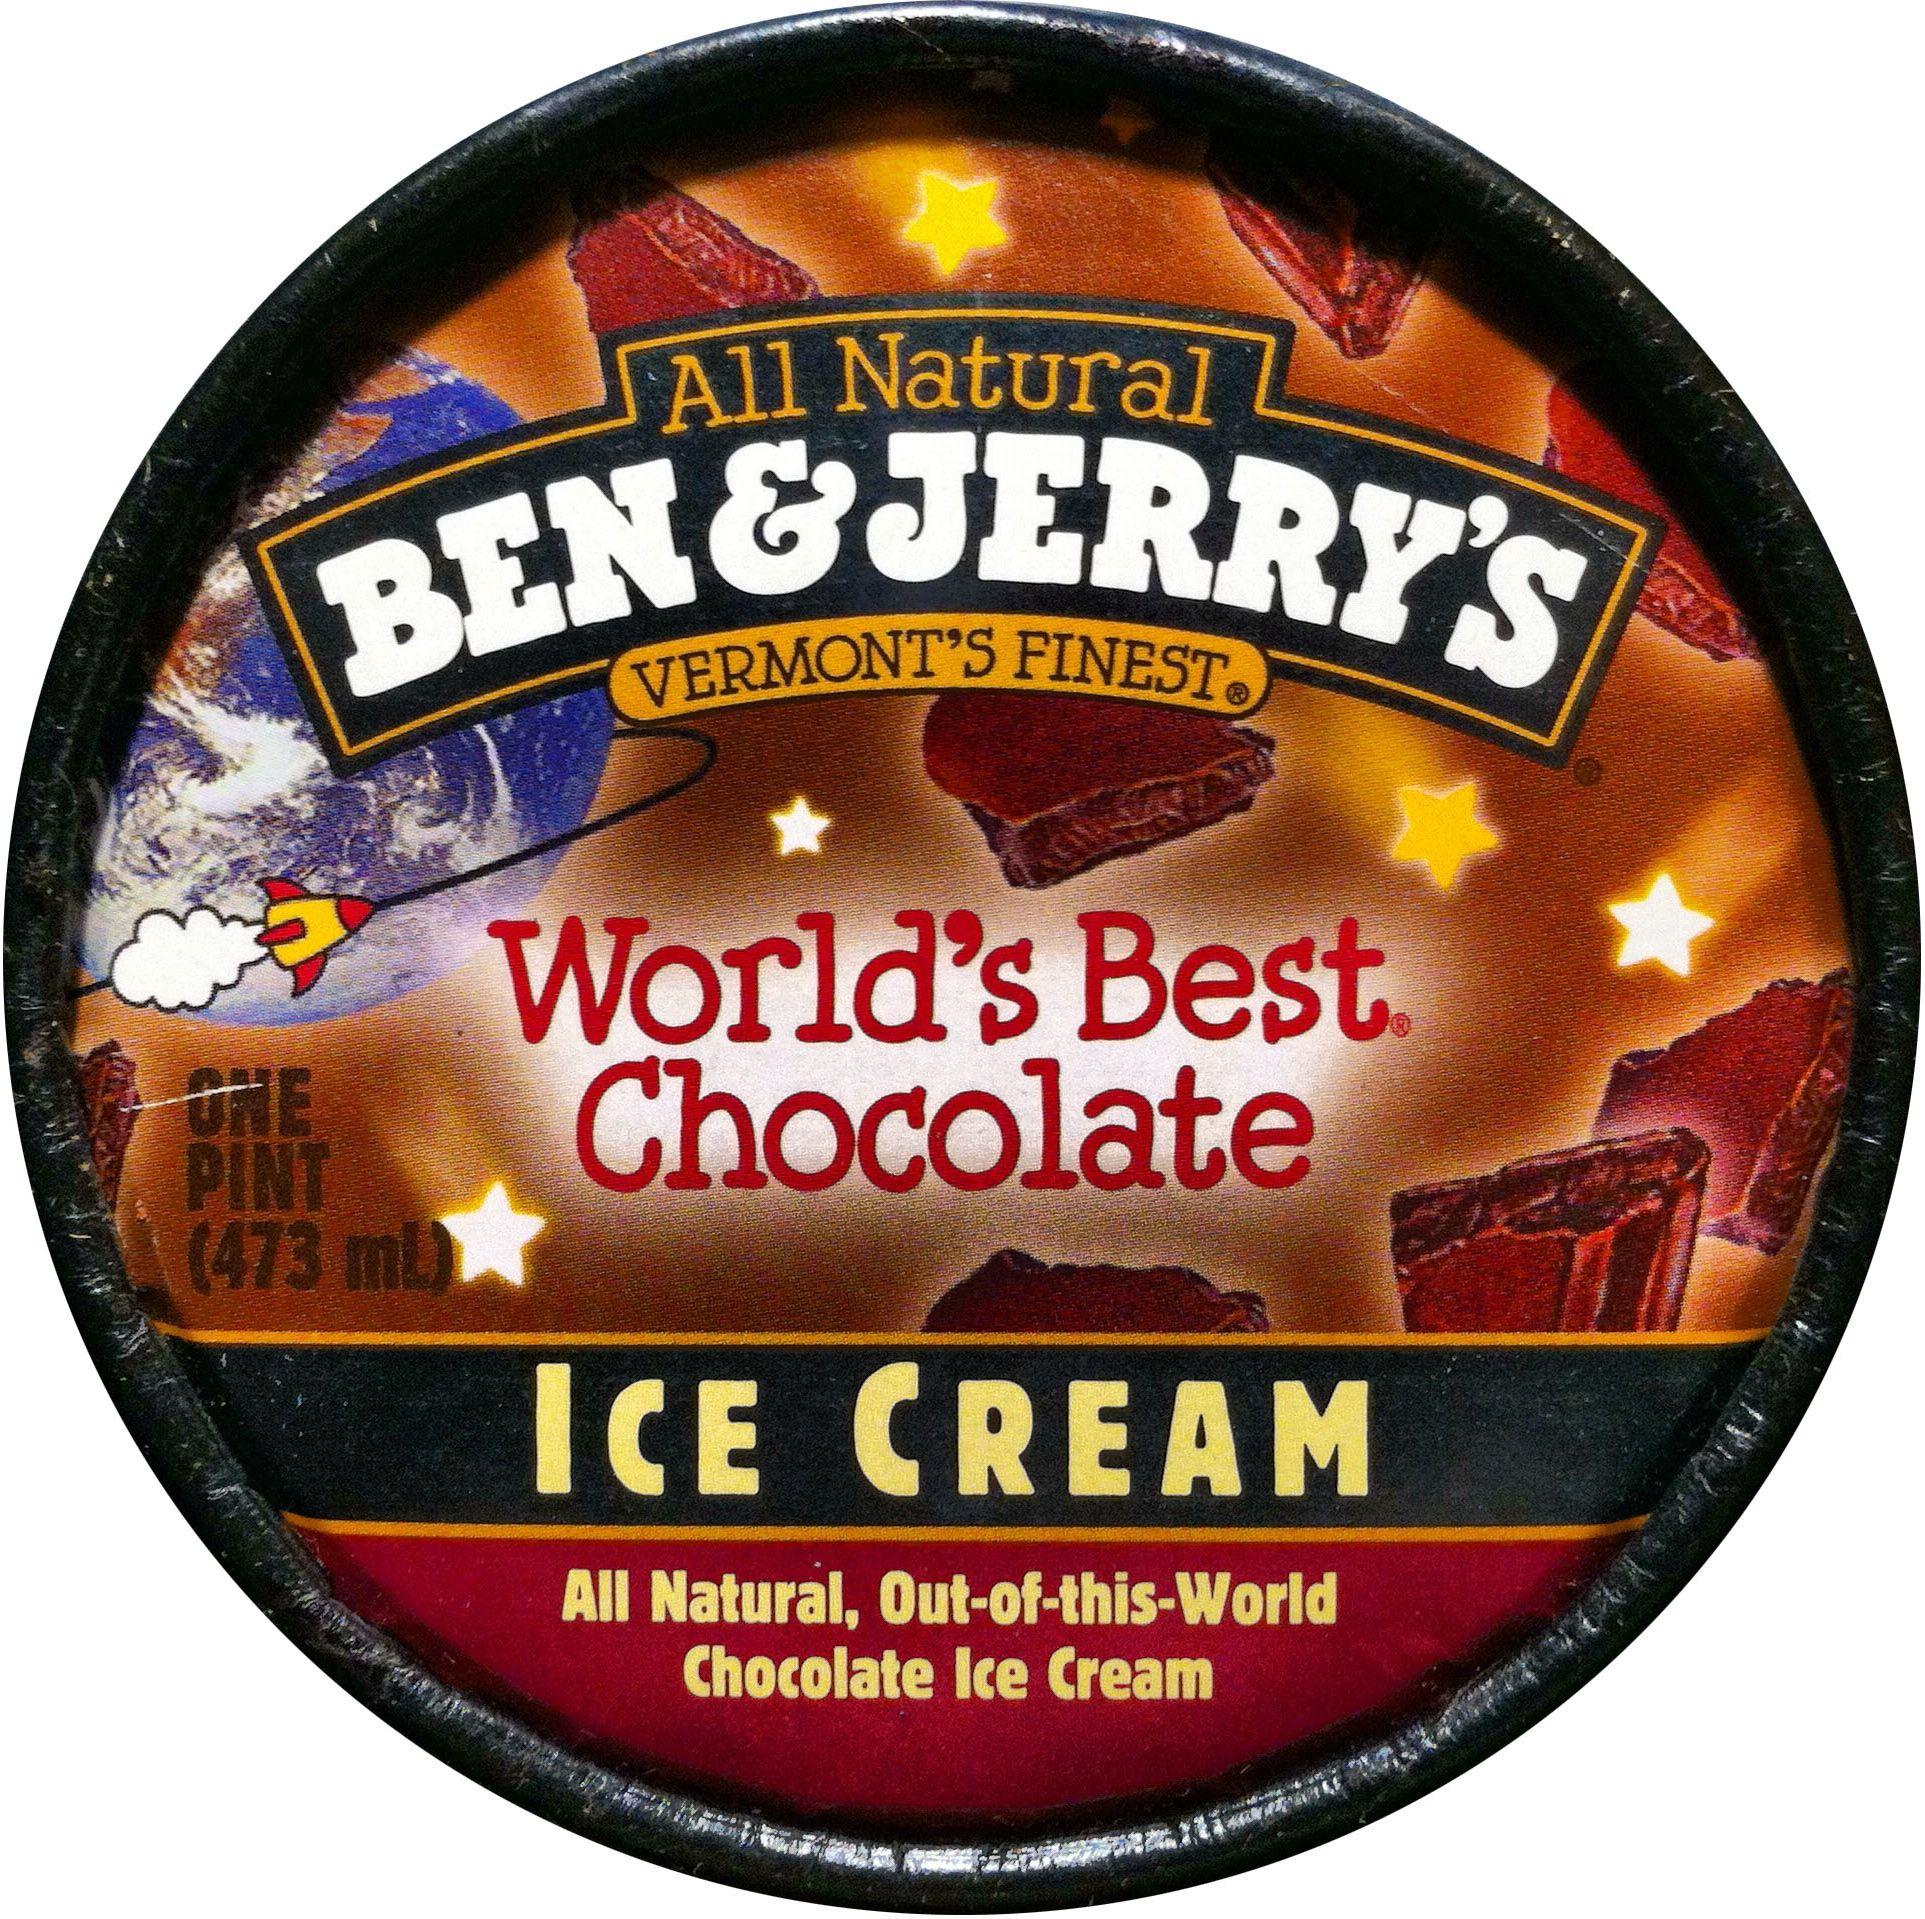 Ben & Jerry's World's Best Chocolate, New for 2000 | 2000 Ben ...